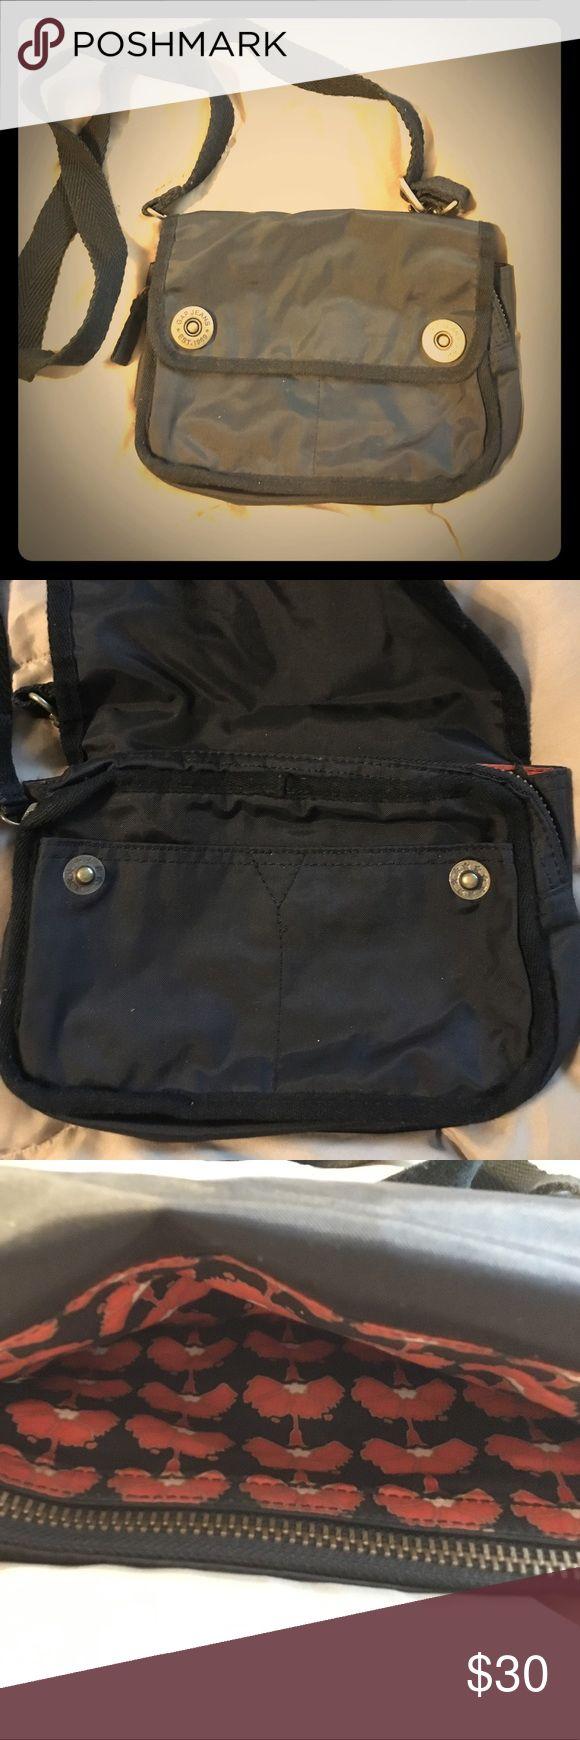 Gap Purse Cute small handbag. Perfect for many occasions GAP Bags Mini Bags